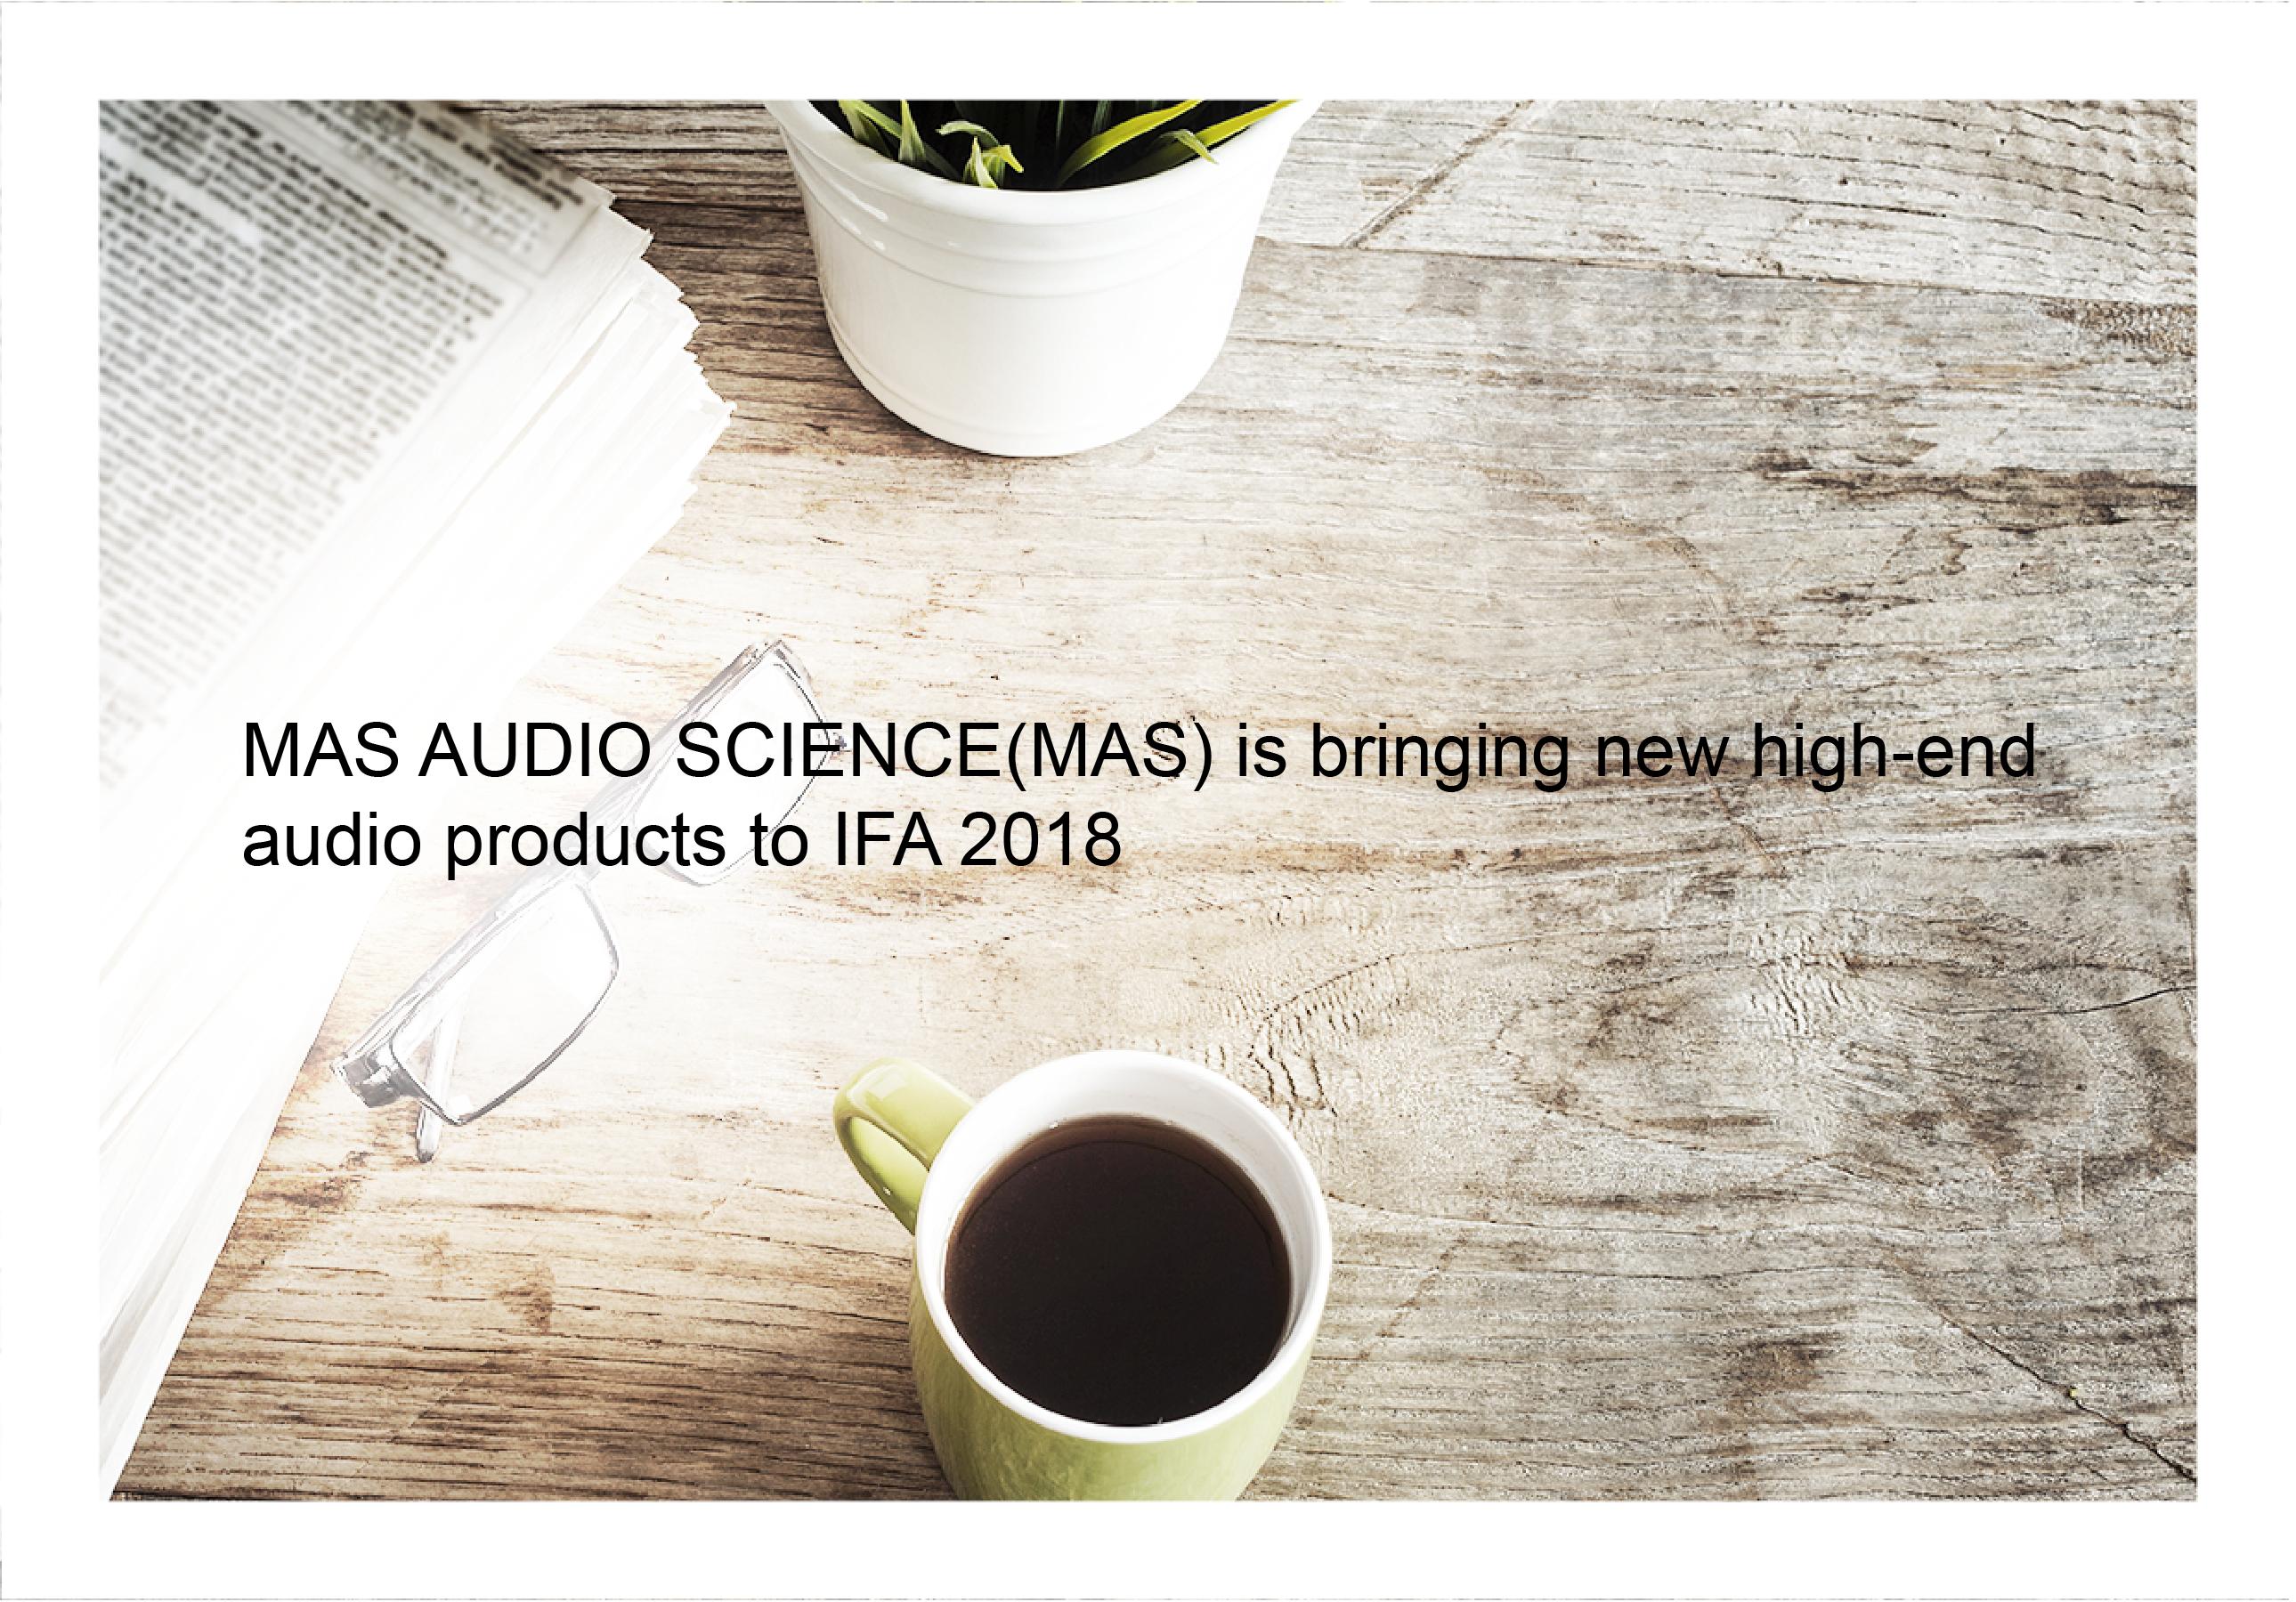 MAS AUDIO SCIENCE is bringing new high-end audio headphones to IFA in Berlin.